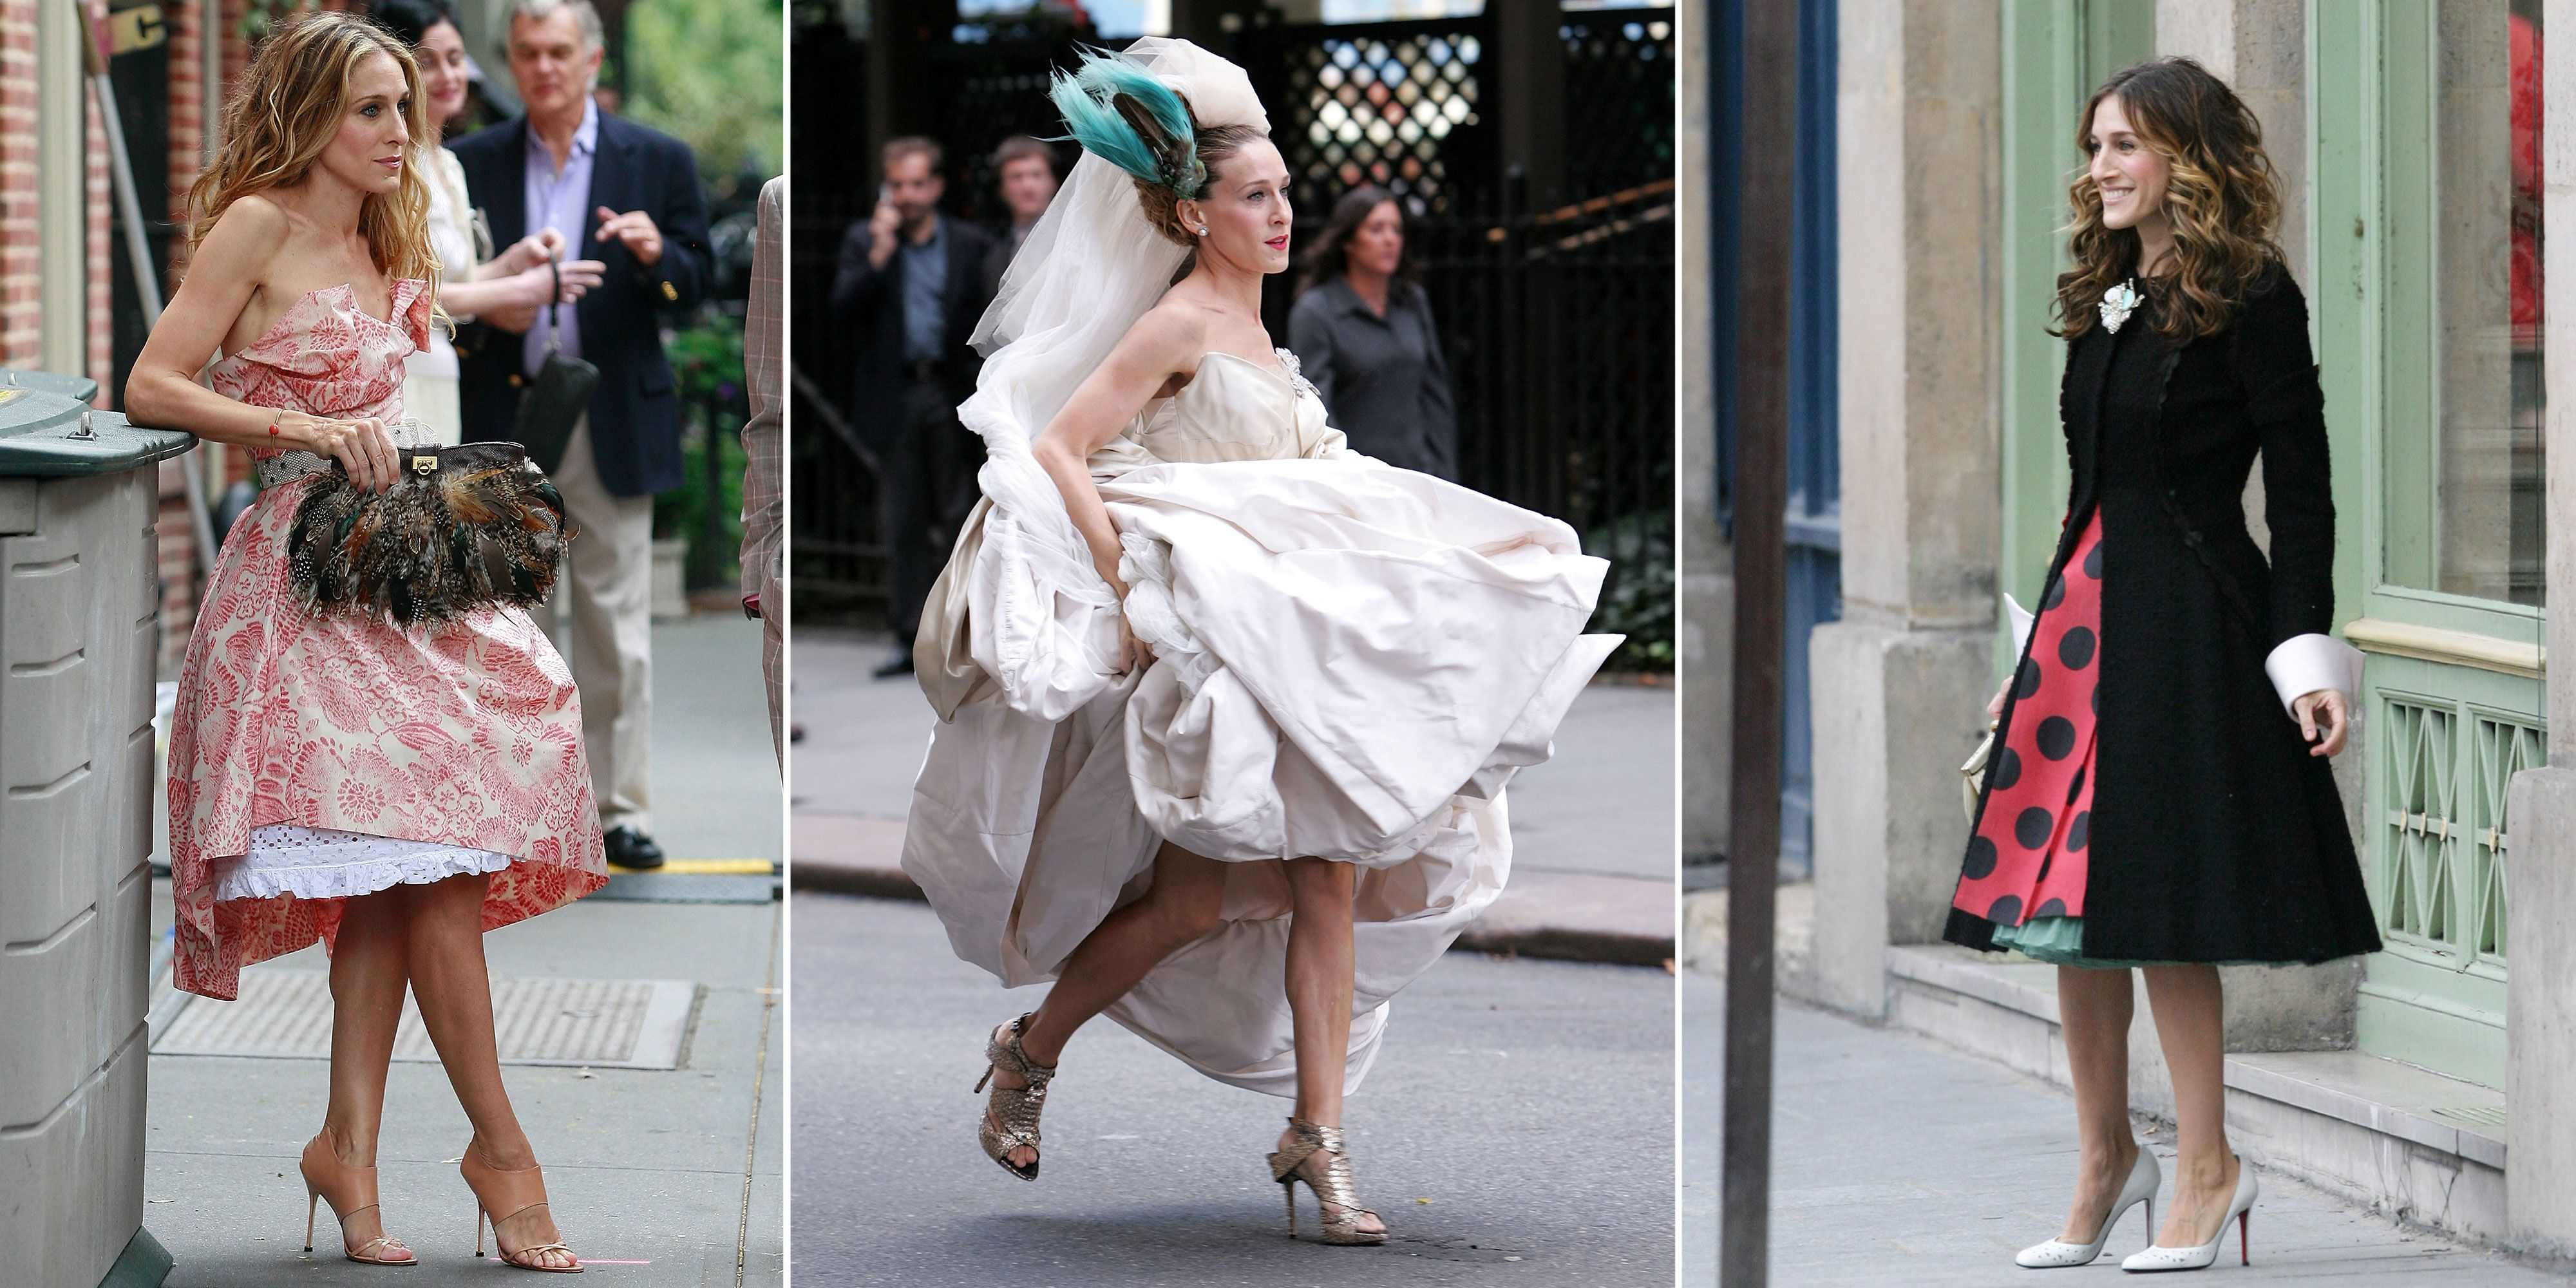 Best Sjp Carrie Bradshaw's Sjp Carrie Best Shoes Bradshaw's Shoes dxCorBe